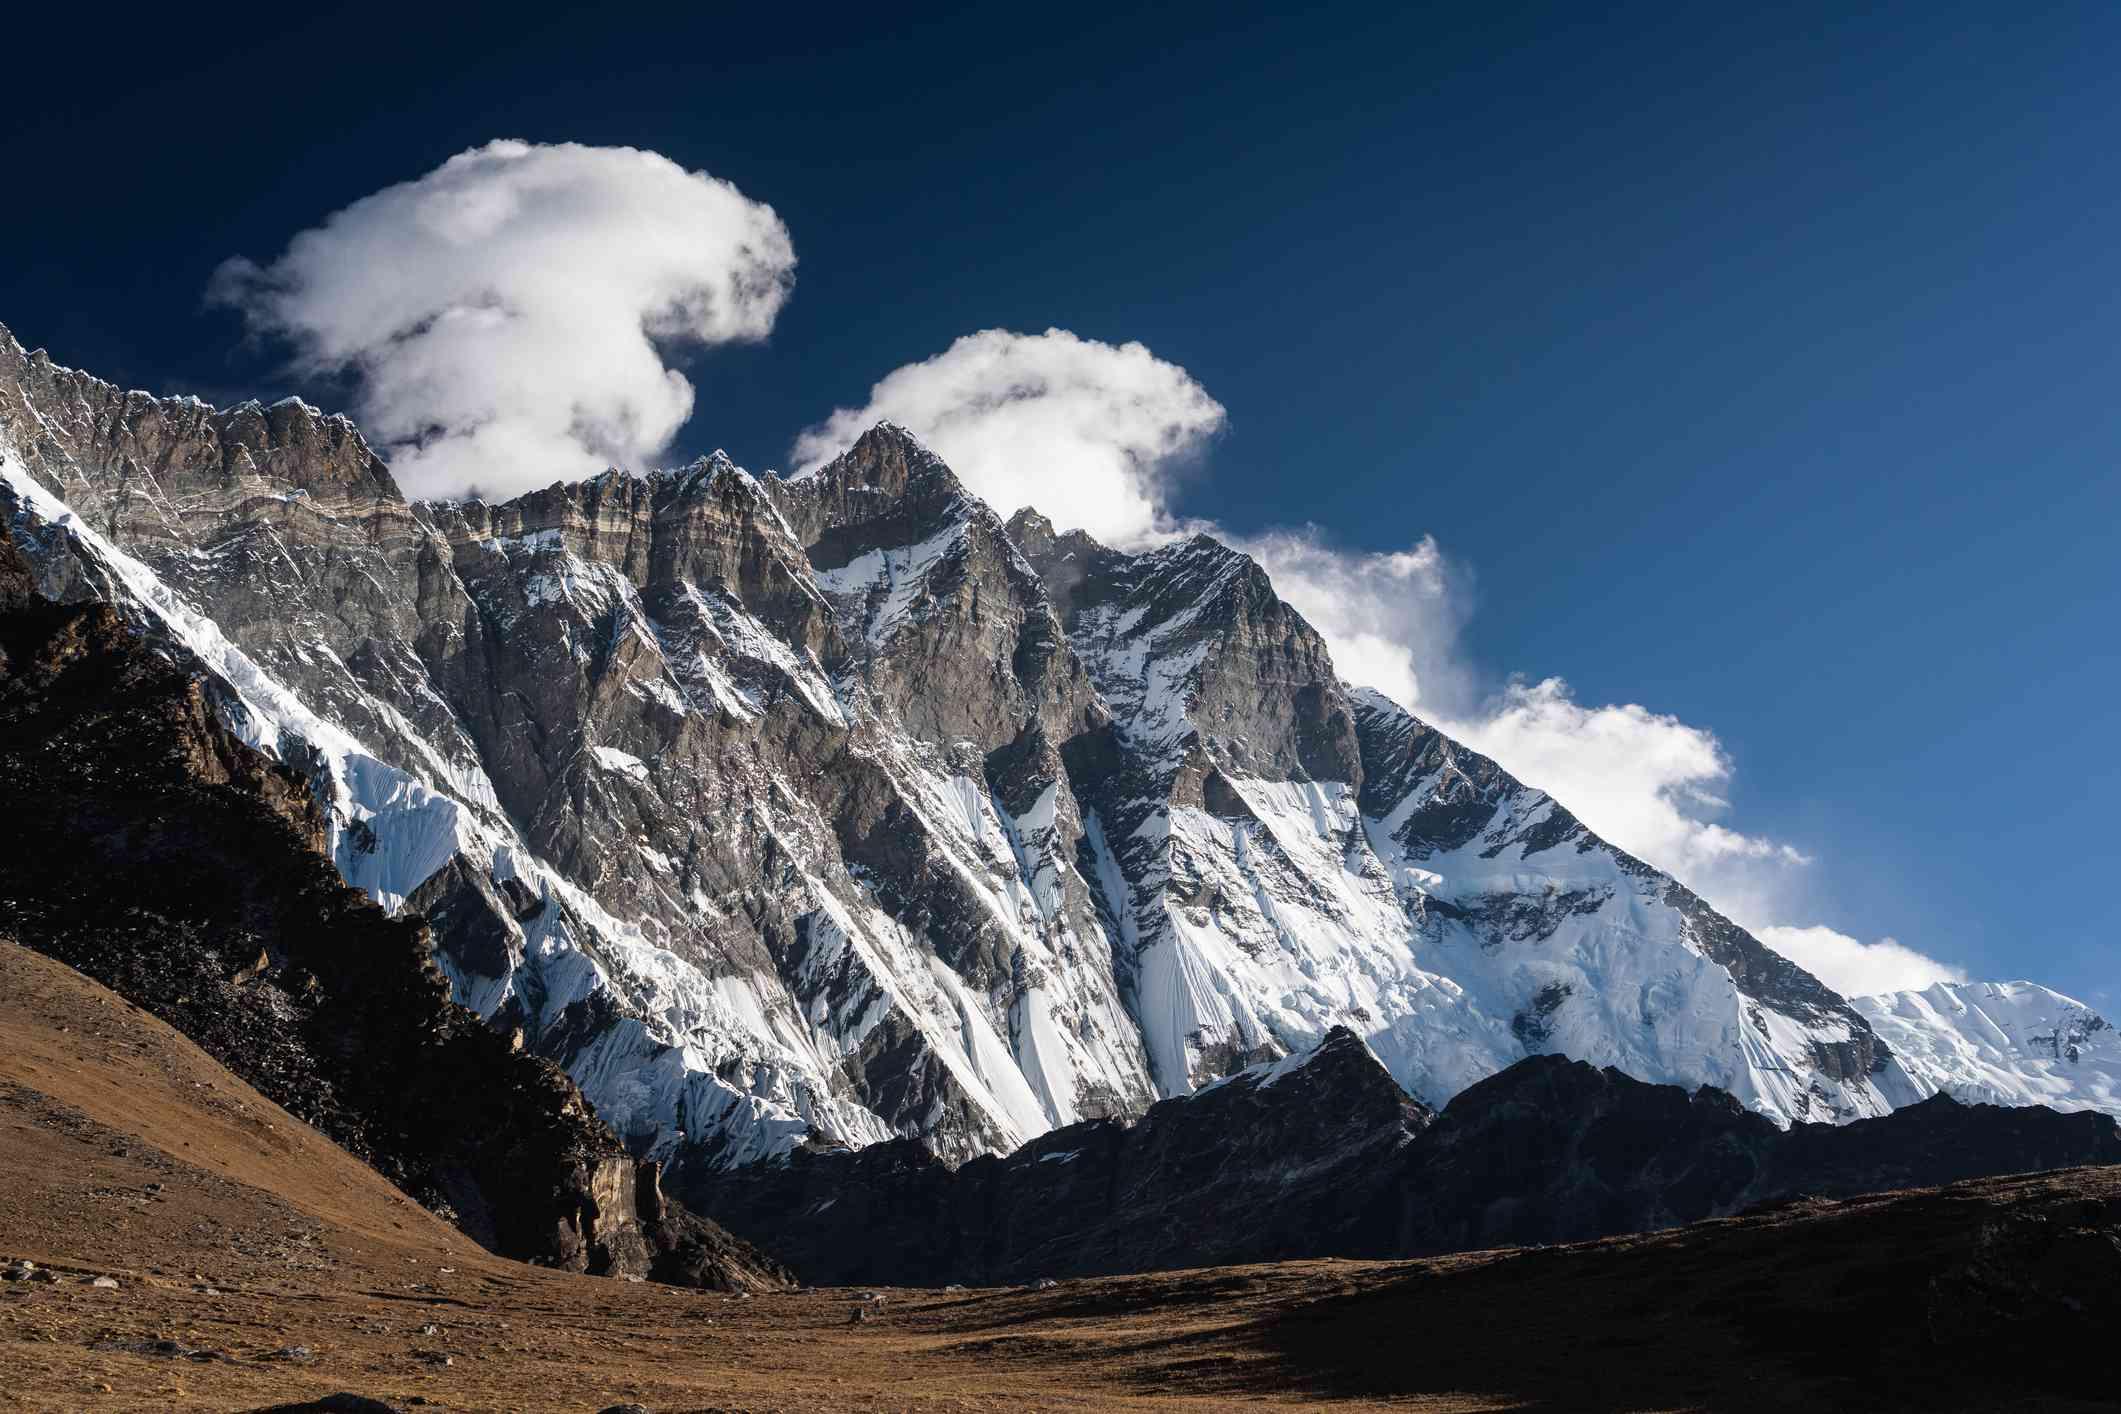 Lhotse mountain from Chukung Ri